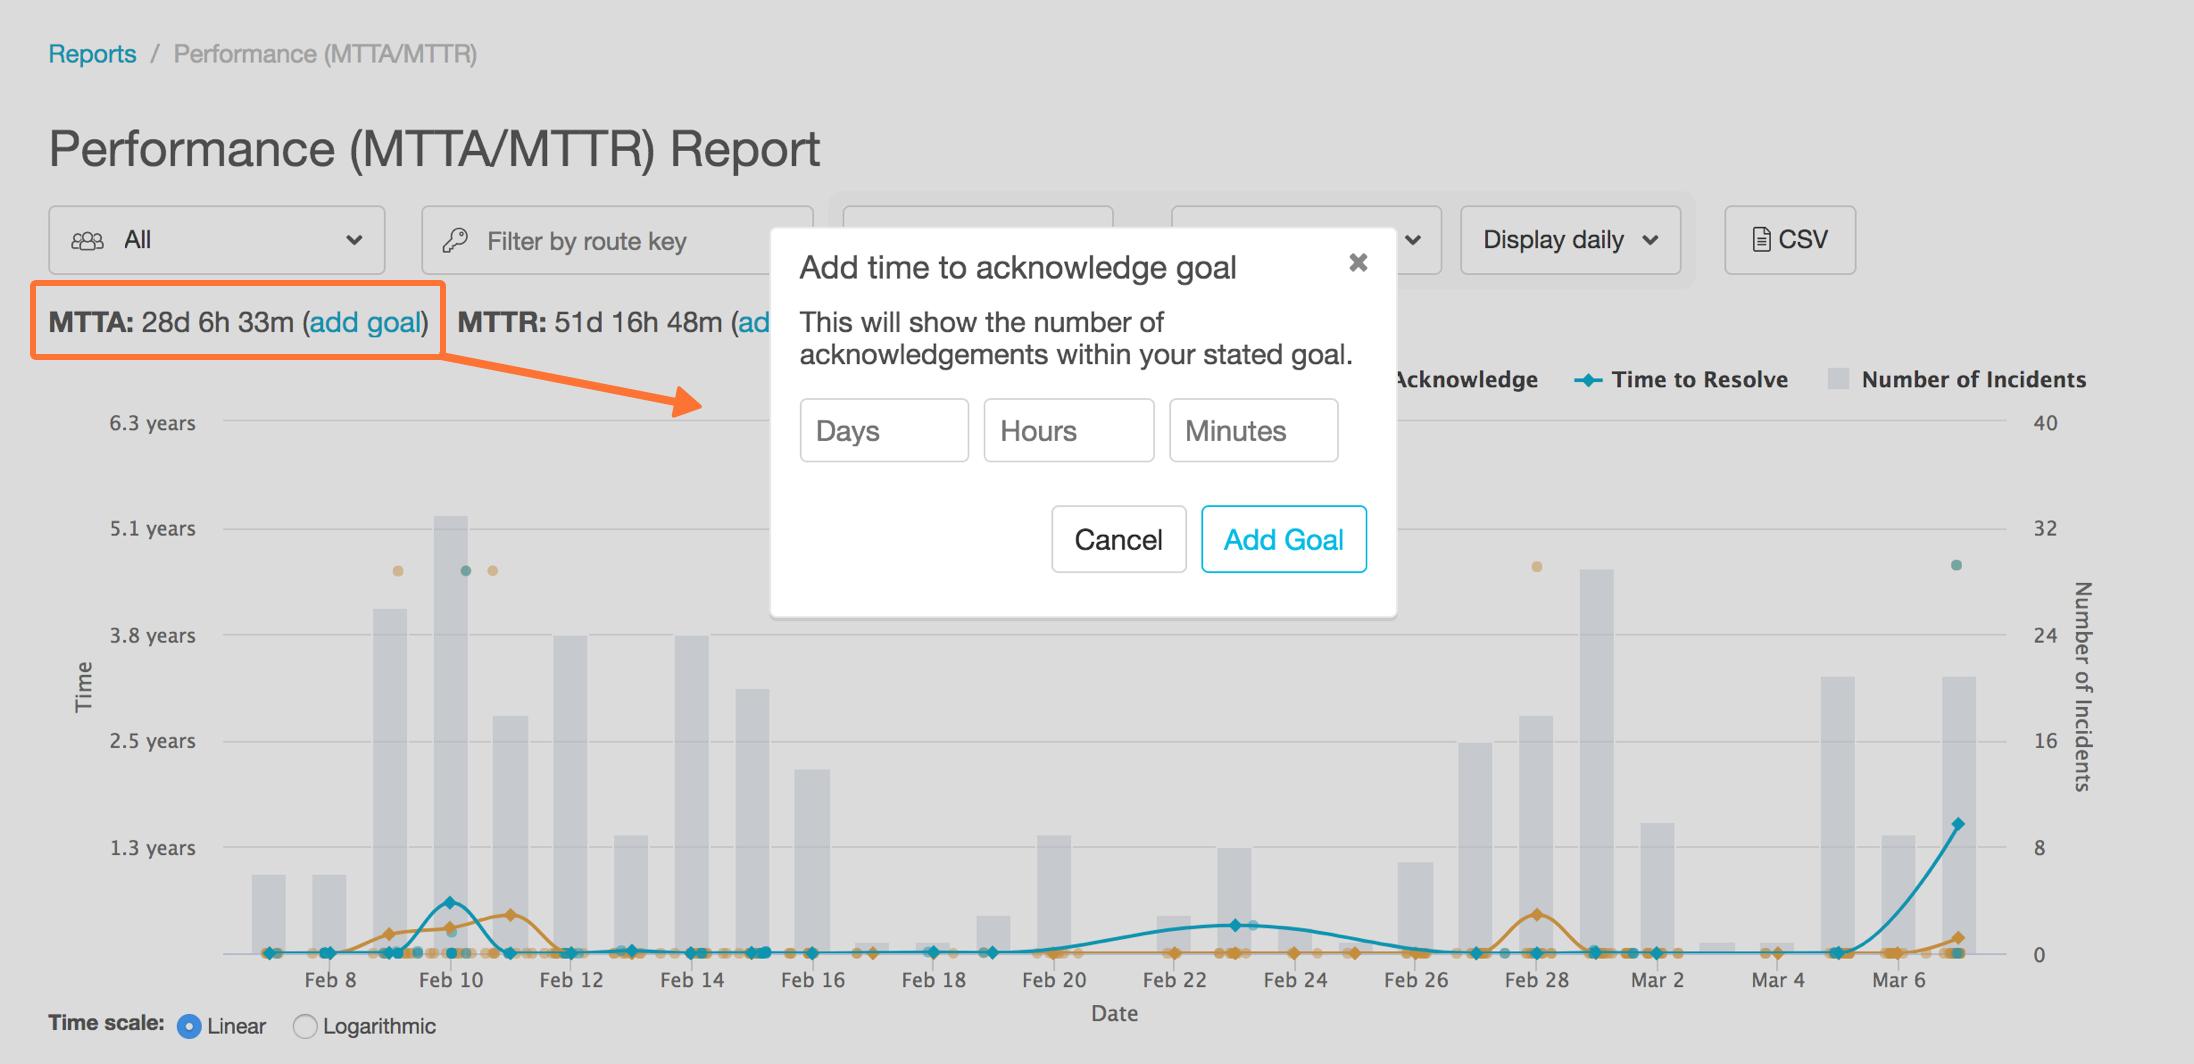 MTTA MTTR Goal Tracking Report - VictorOps